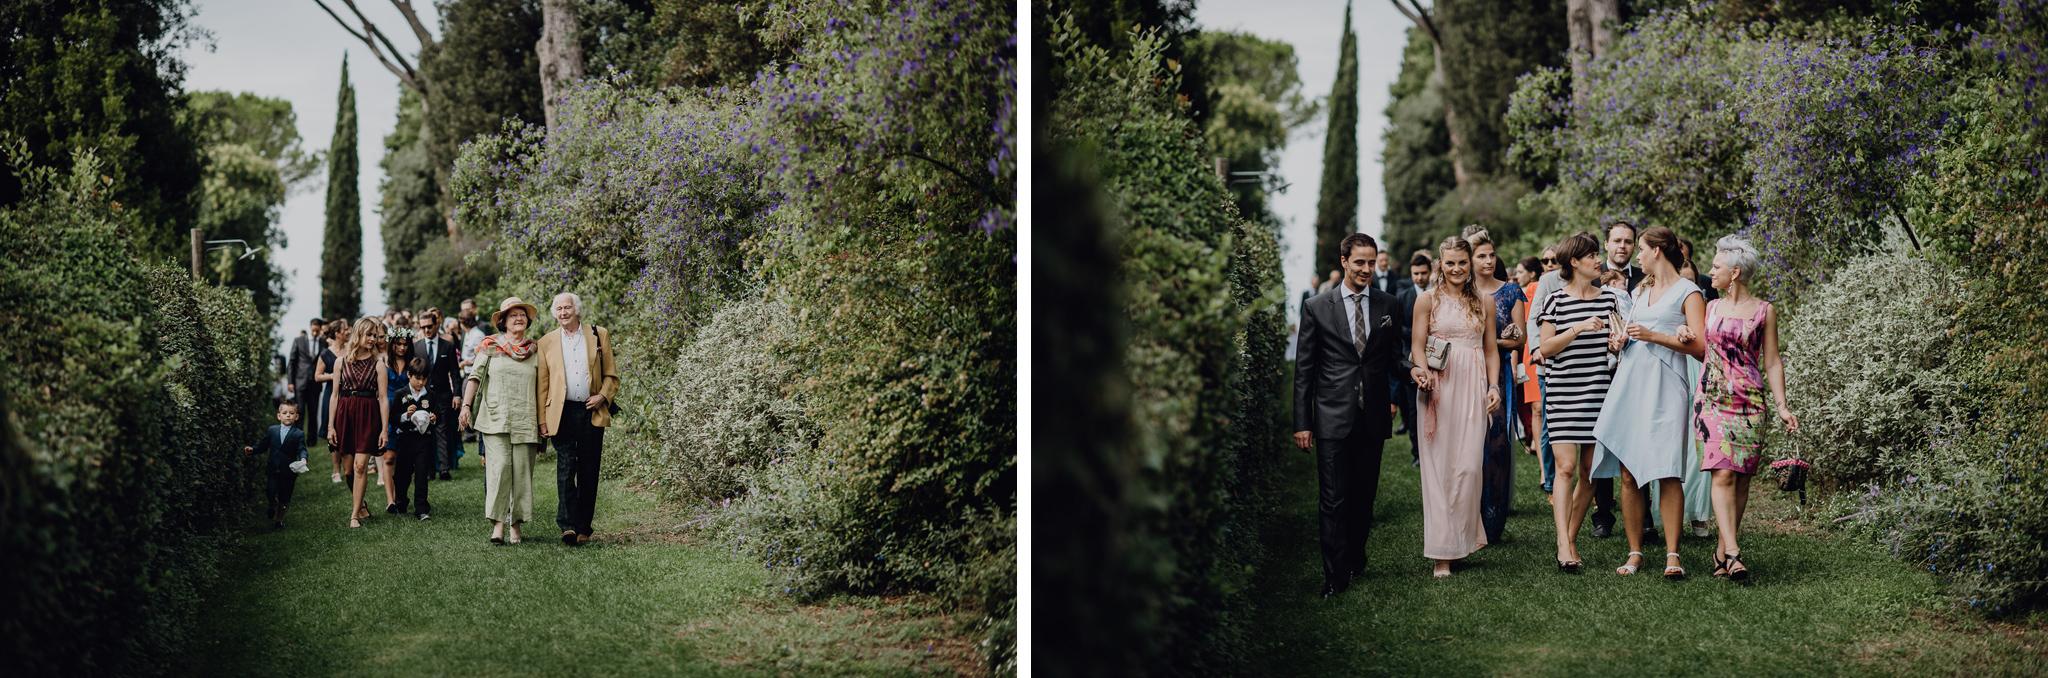 078_set_fotografico_matrimonio_toscana